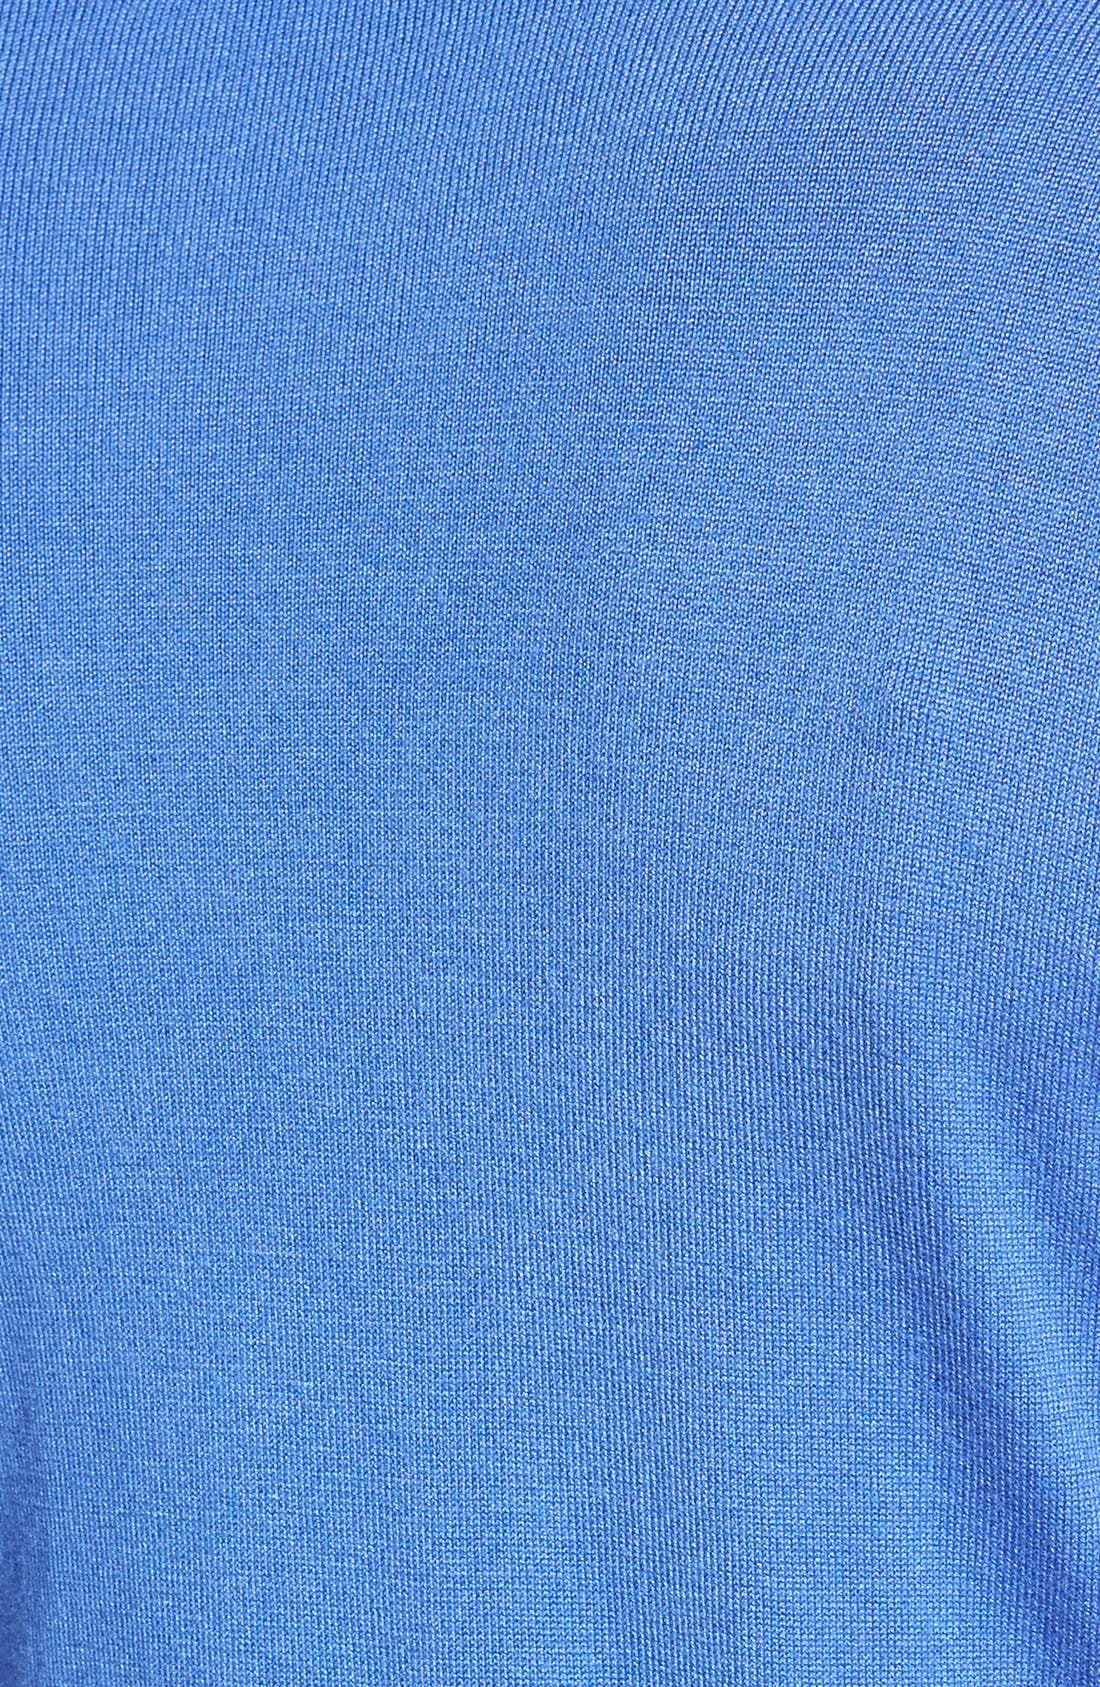 Three Quarter Sleeve Cardigan,                             Alternate thumbnail 249, color,